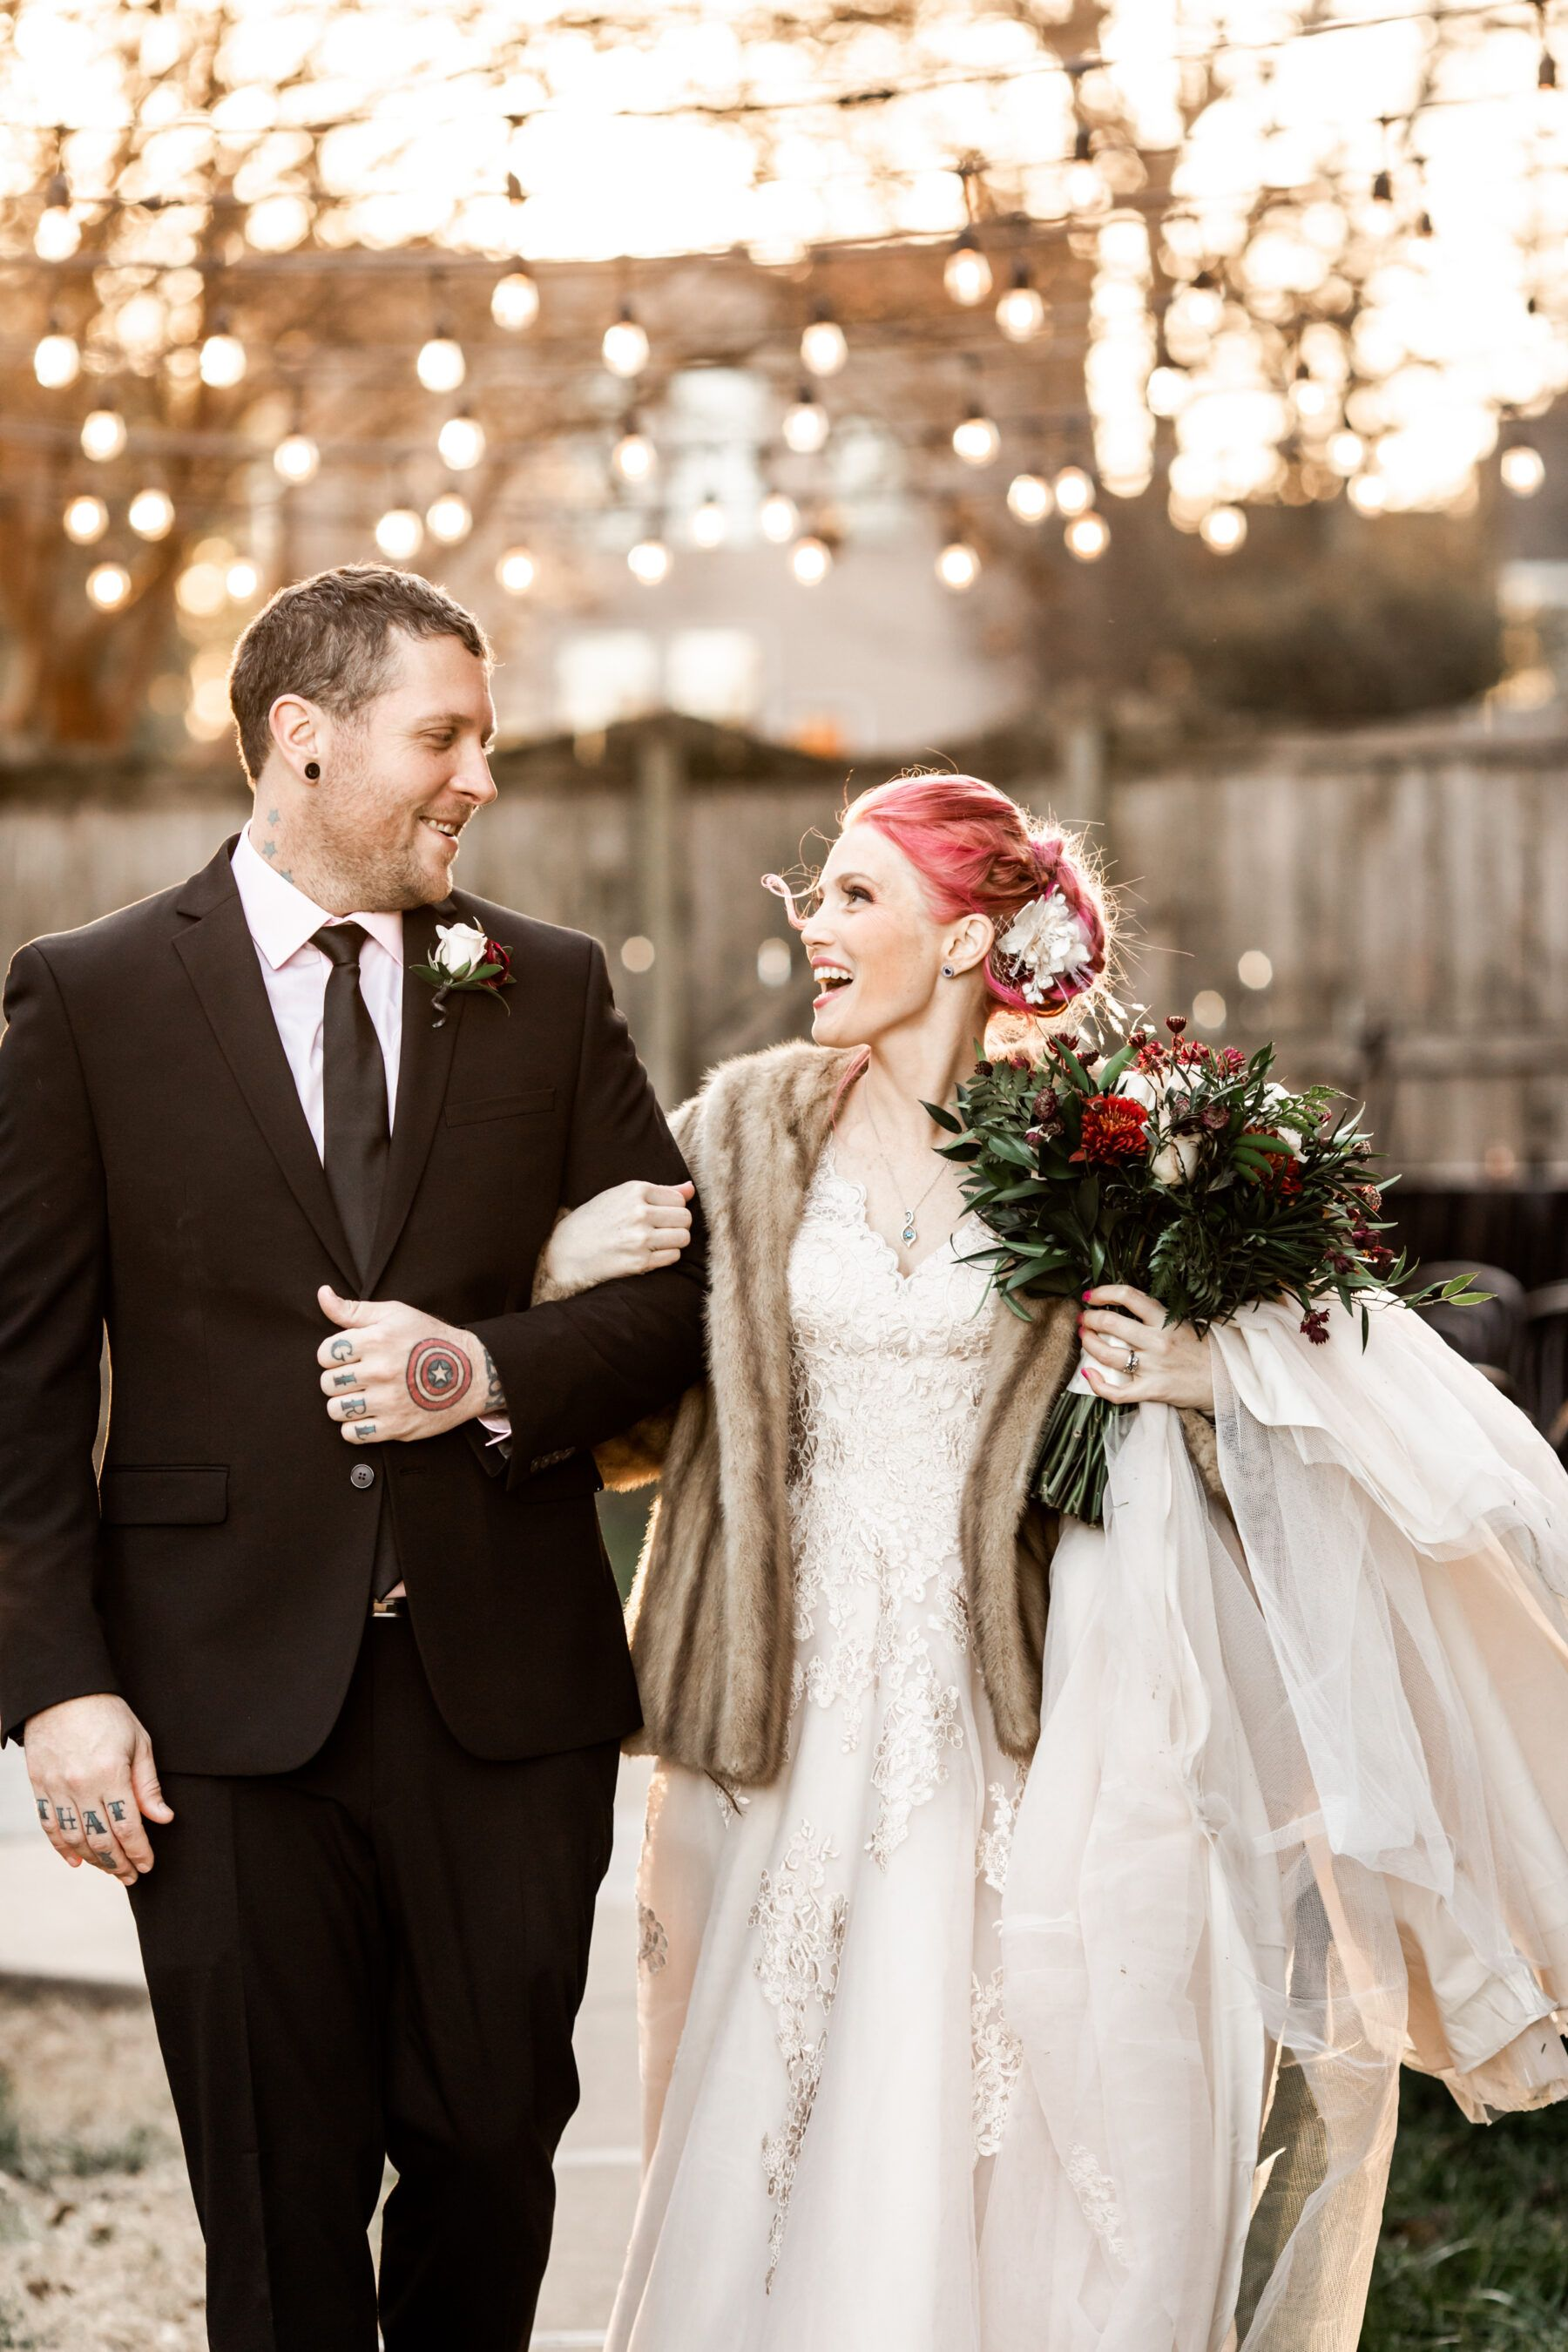 Winter Wish Upon A Wedding By Laurie D Anne Events Nashville Bride Guide In 2020 Nashville Bride Bride Guide Bride